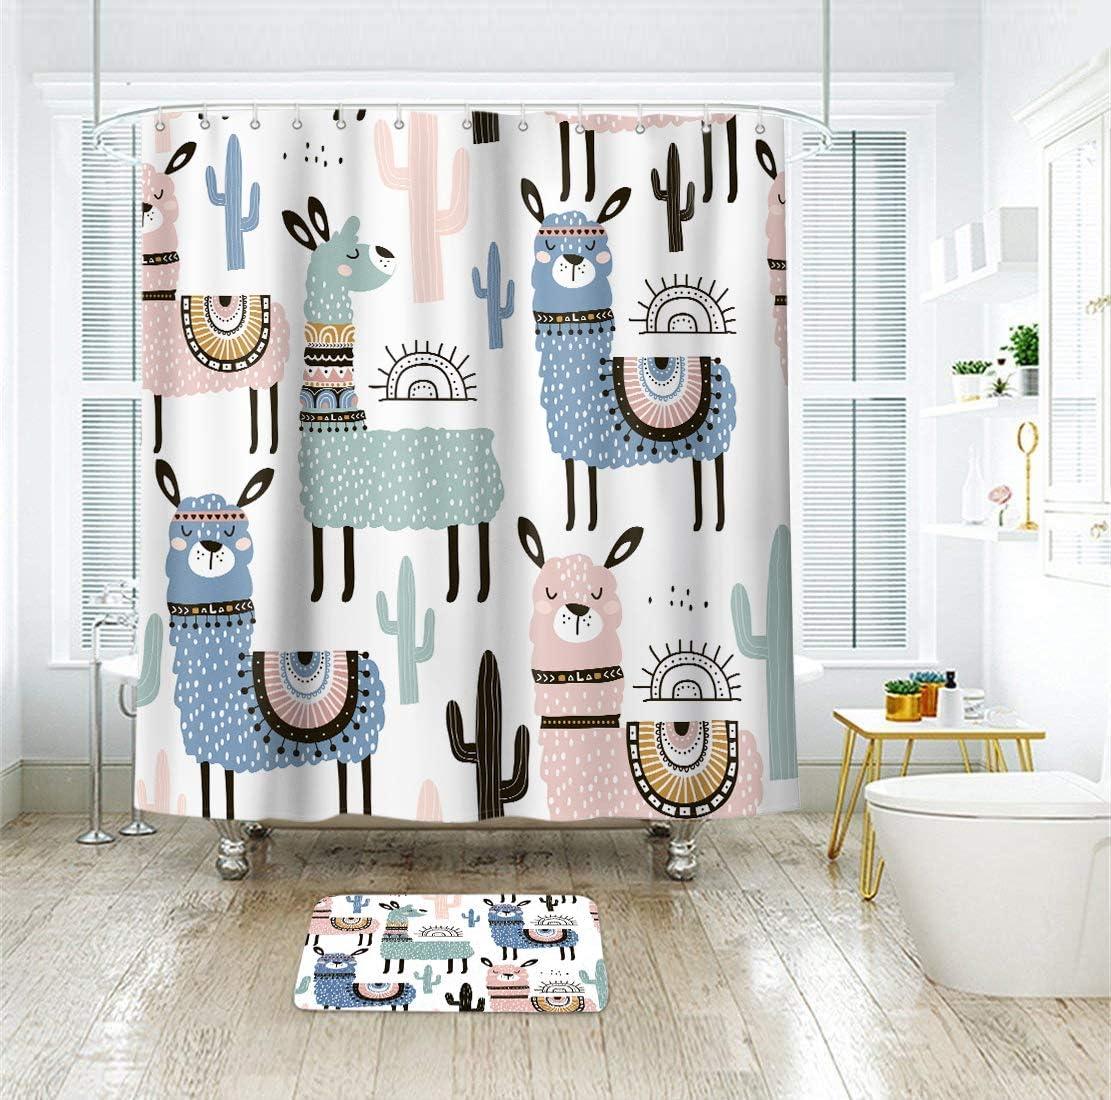 69x70 Inches JAWO Flamingo Shower Curtains for Bathroom Cartoon Design Tropical Bird Flamingo Pink for Kids Pretty Girl Bedroom Decor Waterproof Fabric Shower Curtain Set